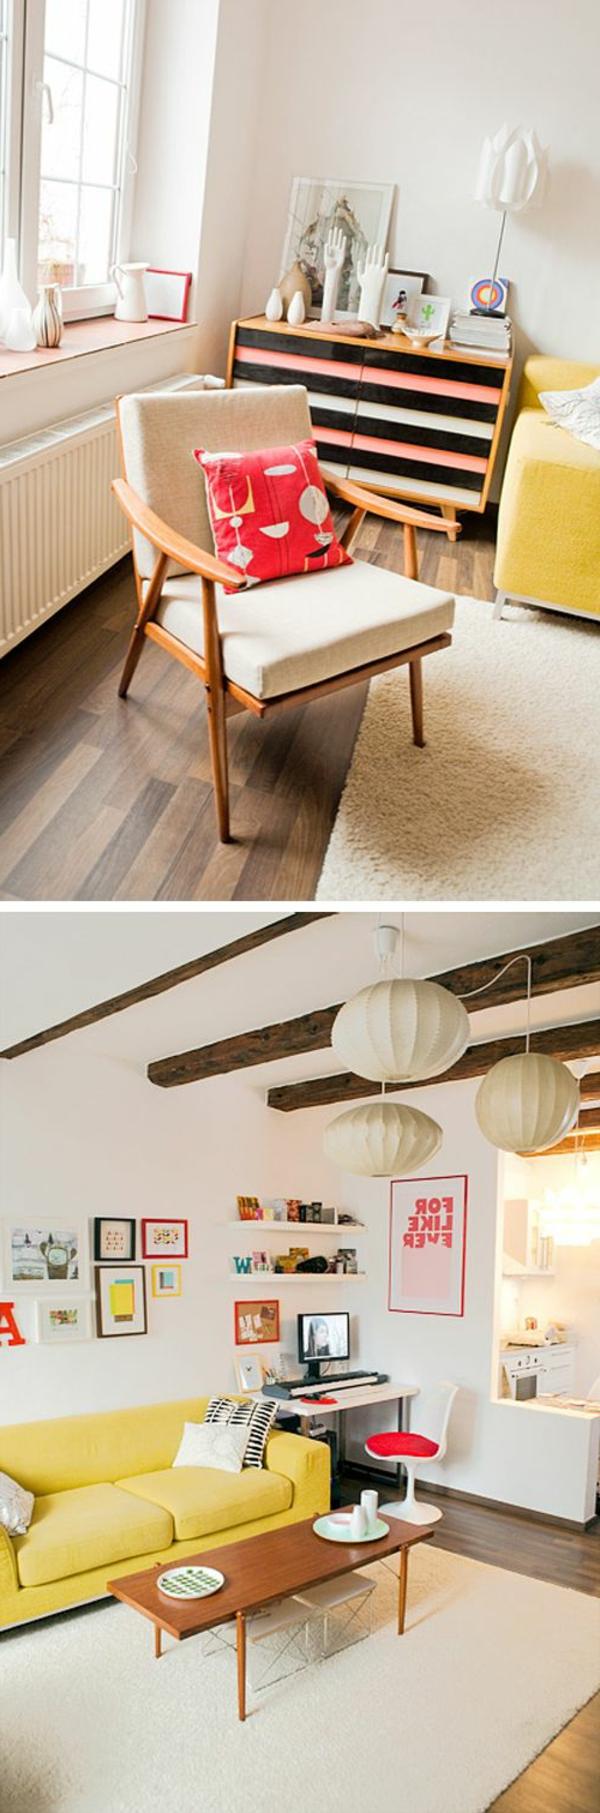 chambre-moderne-salon-rénover